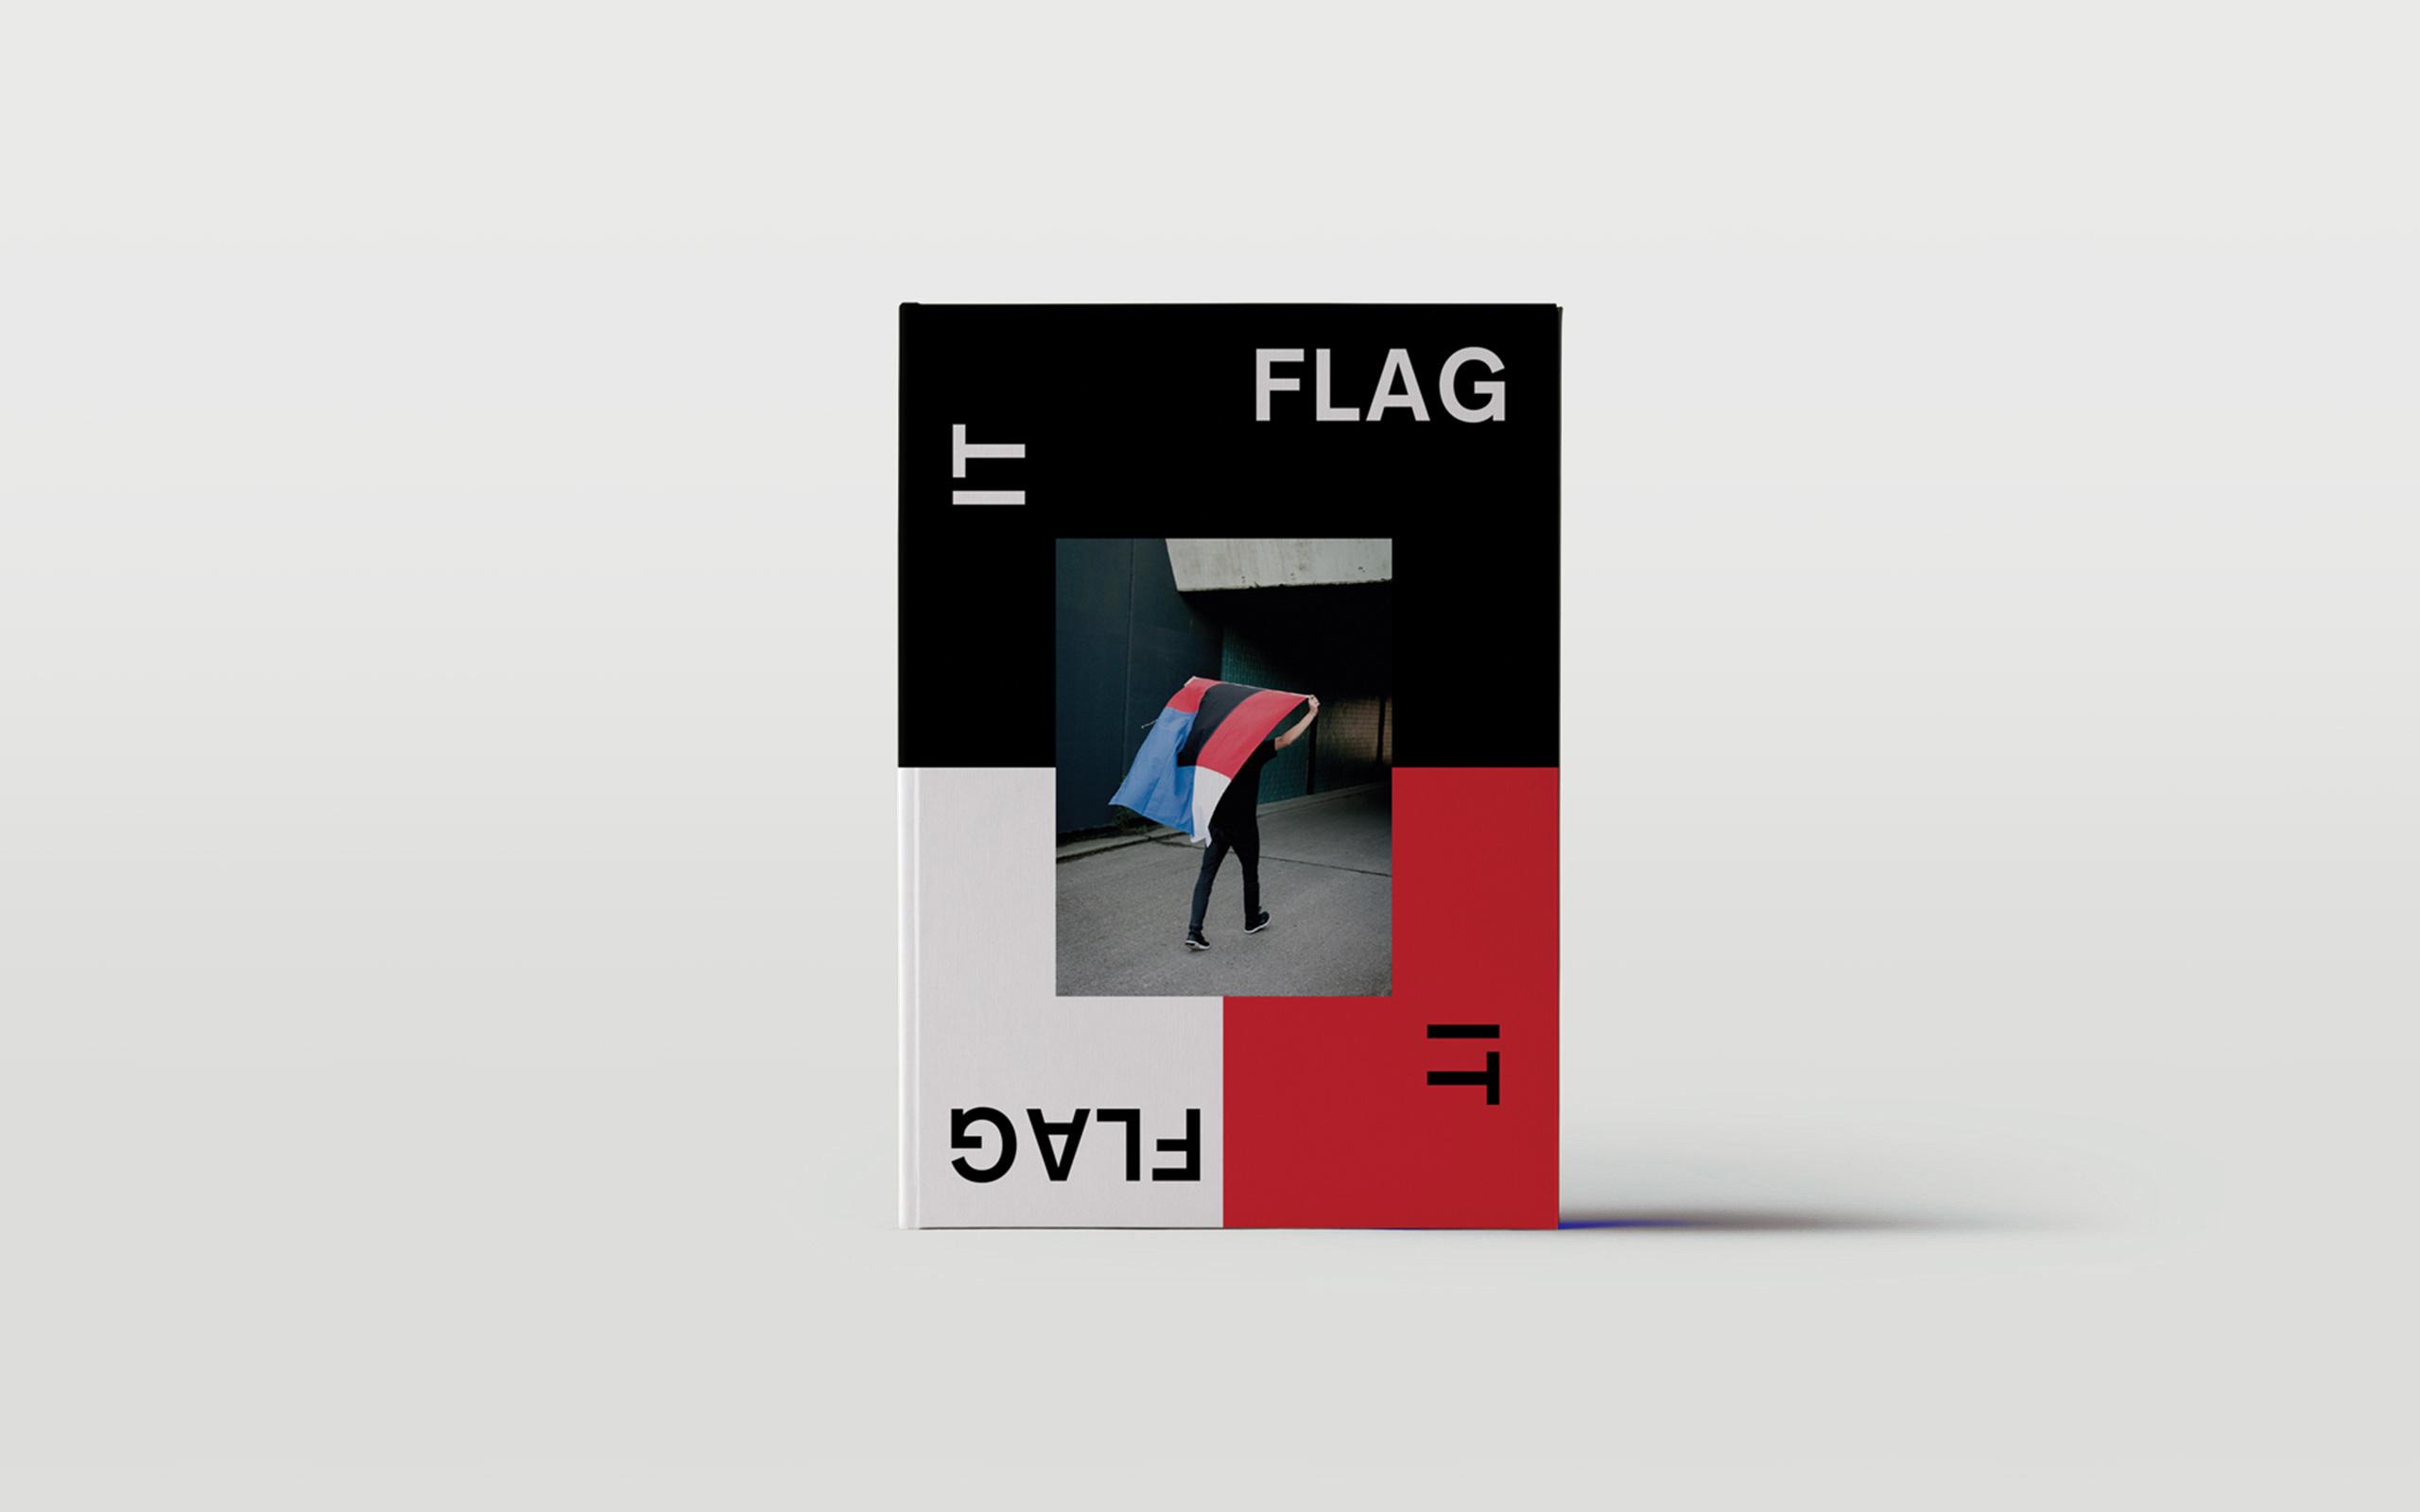 flag-0b